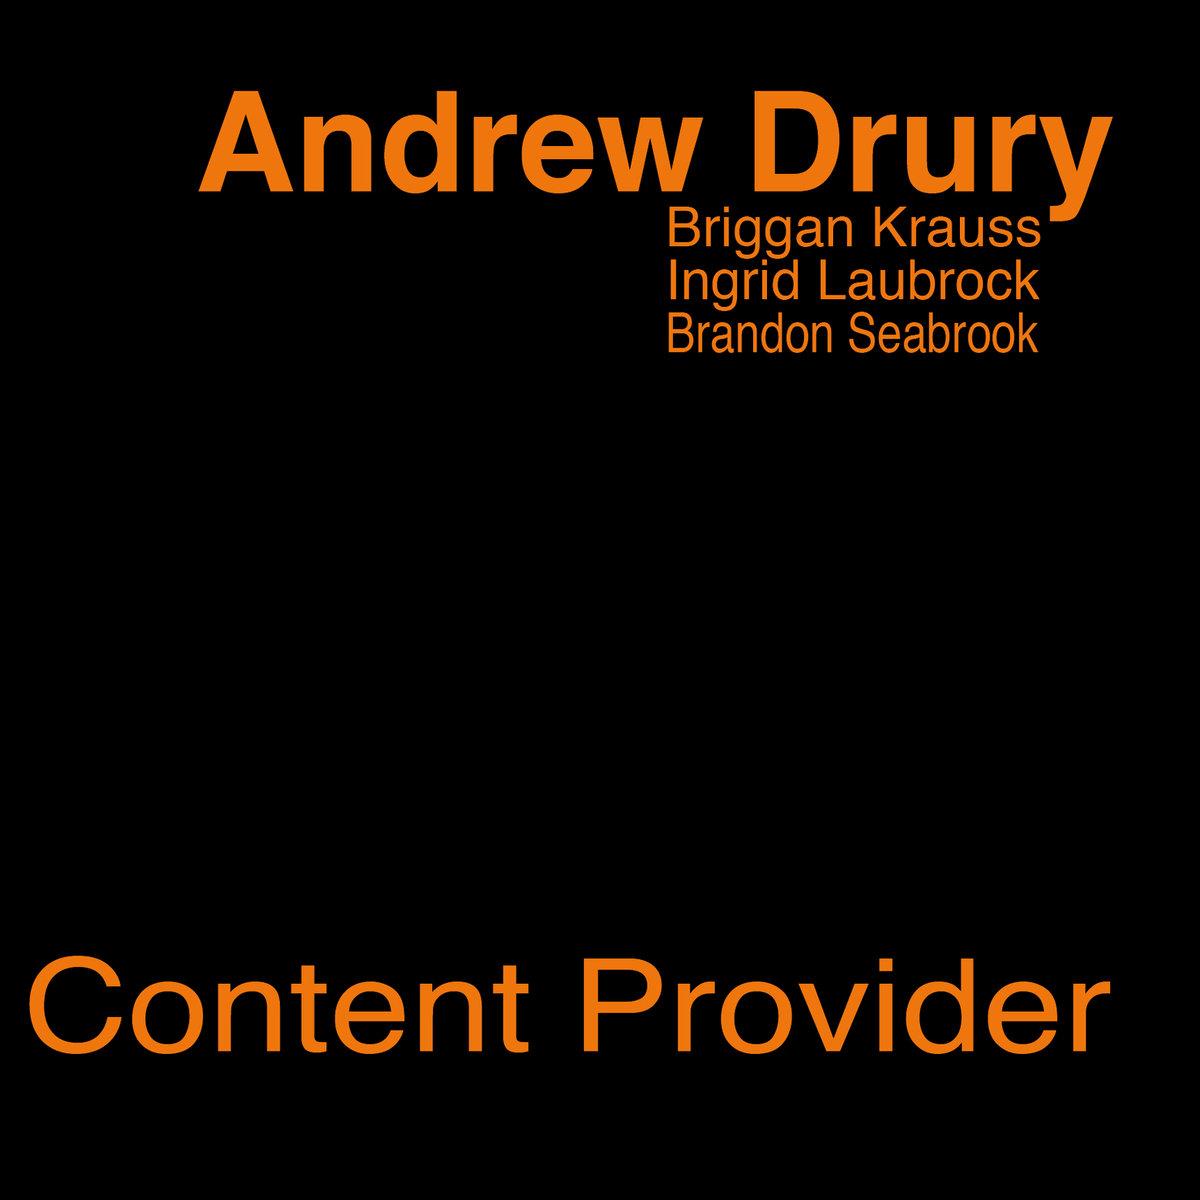 Album Review: Andrew Drury's Content Provider